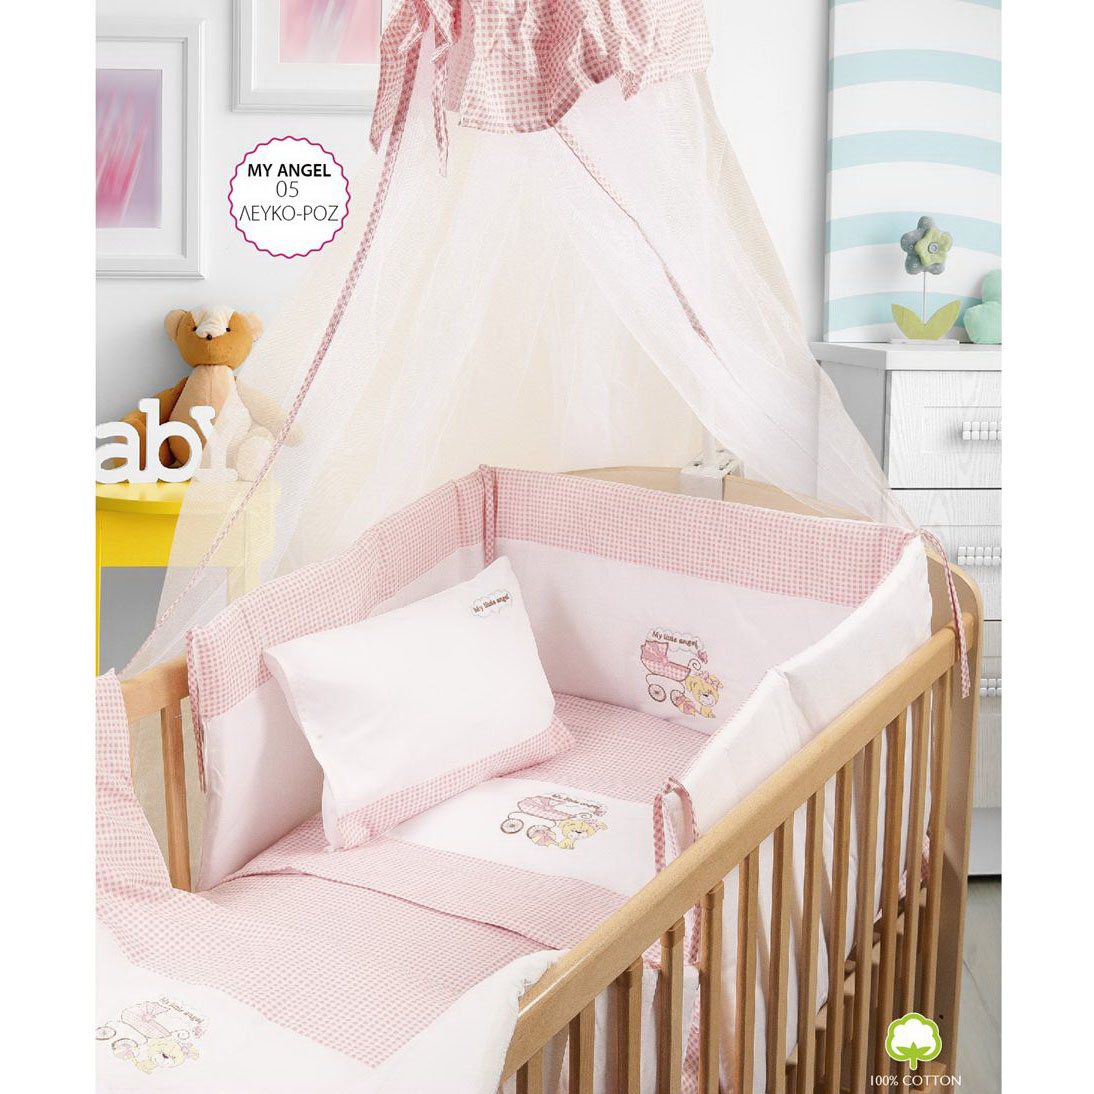 67828e55ba3 Προίκα Μωρού (Dim-My angel) | Lux House | Λευκά Είδη | Διακοσμητικά ...